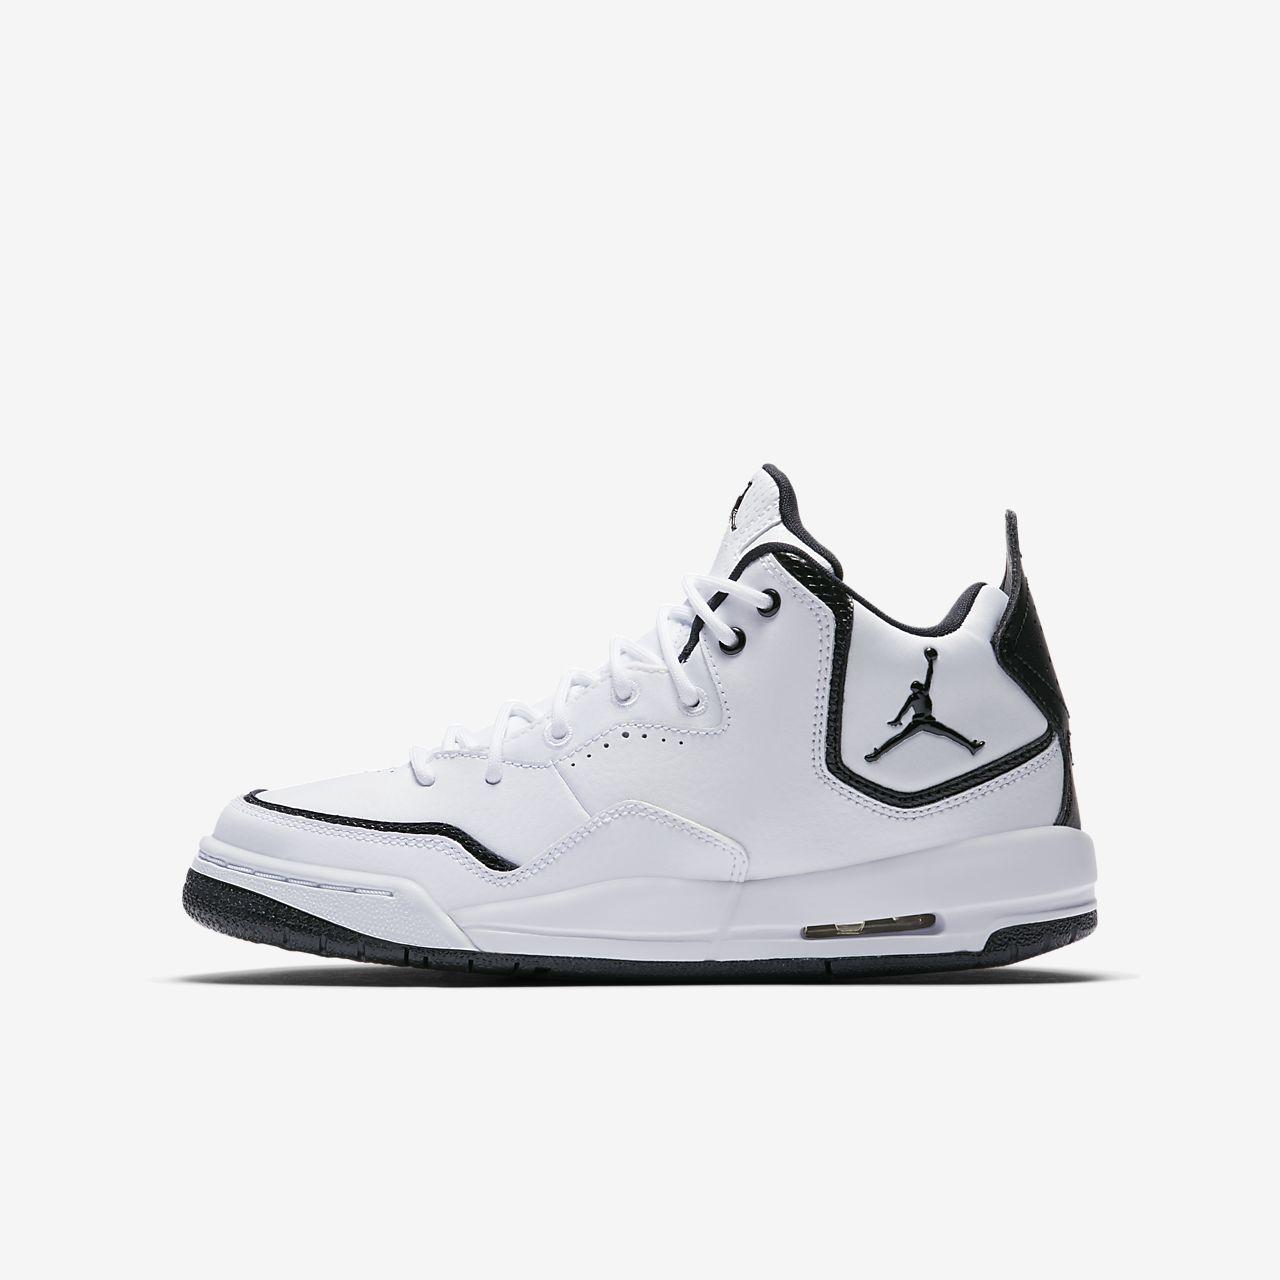 1a08d324653f Jordan Courtside 23 Older Kids  Shoe. Nike.com LU